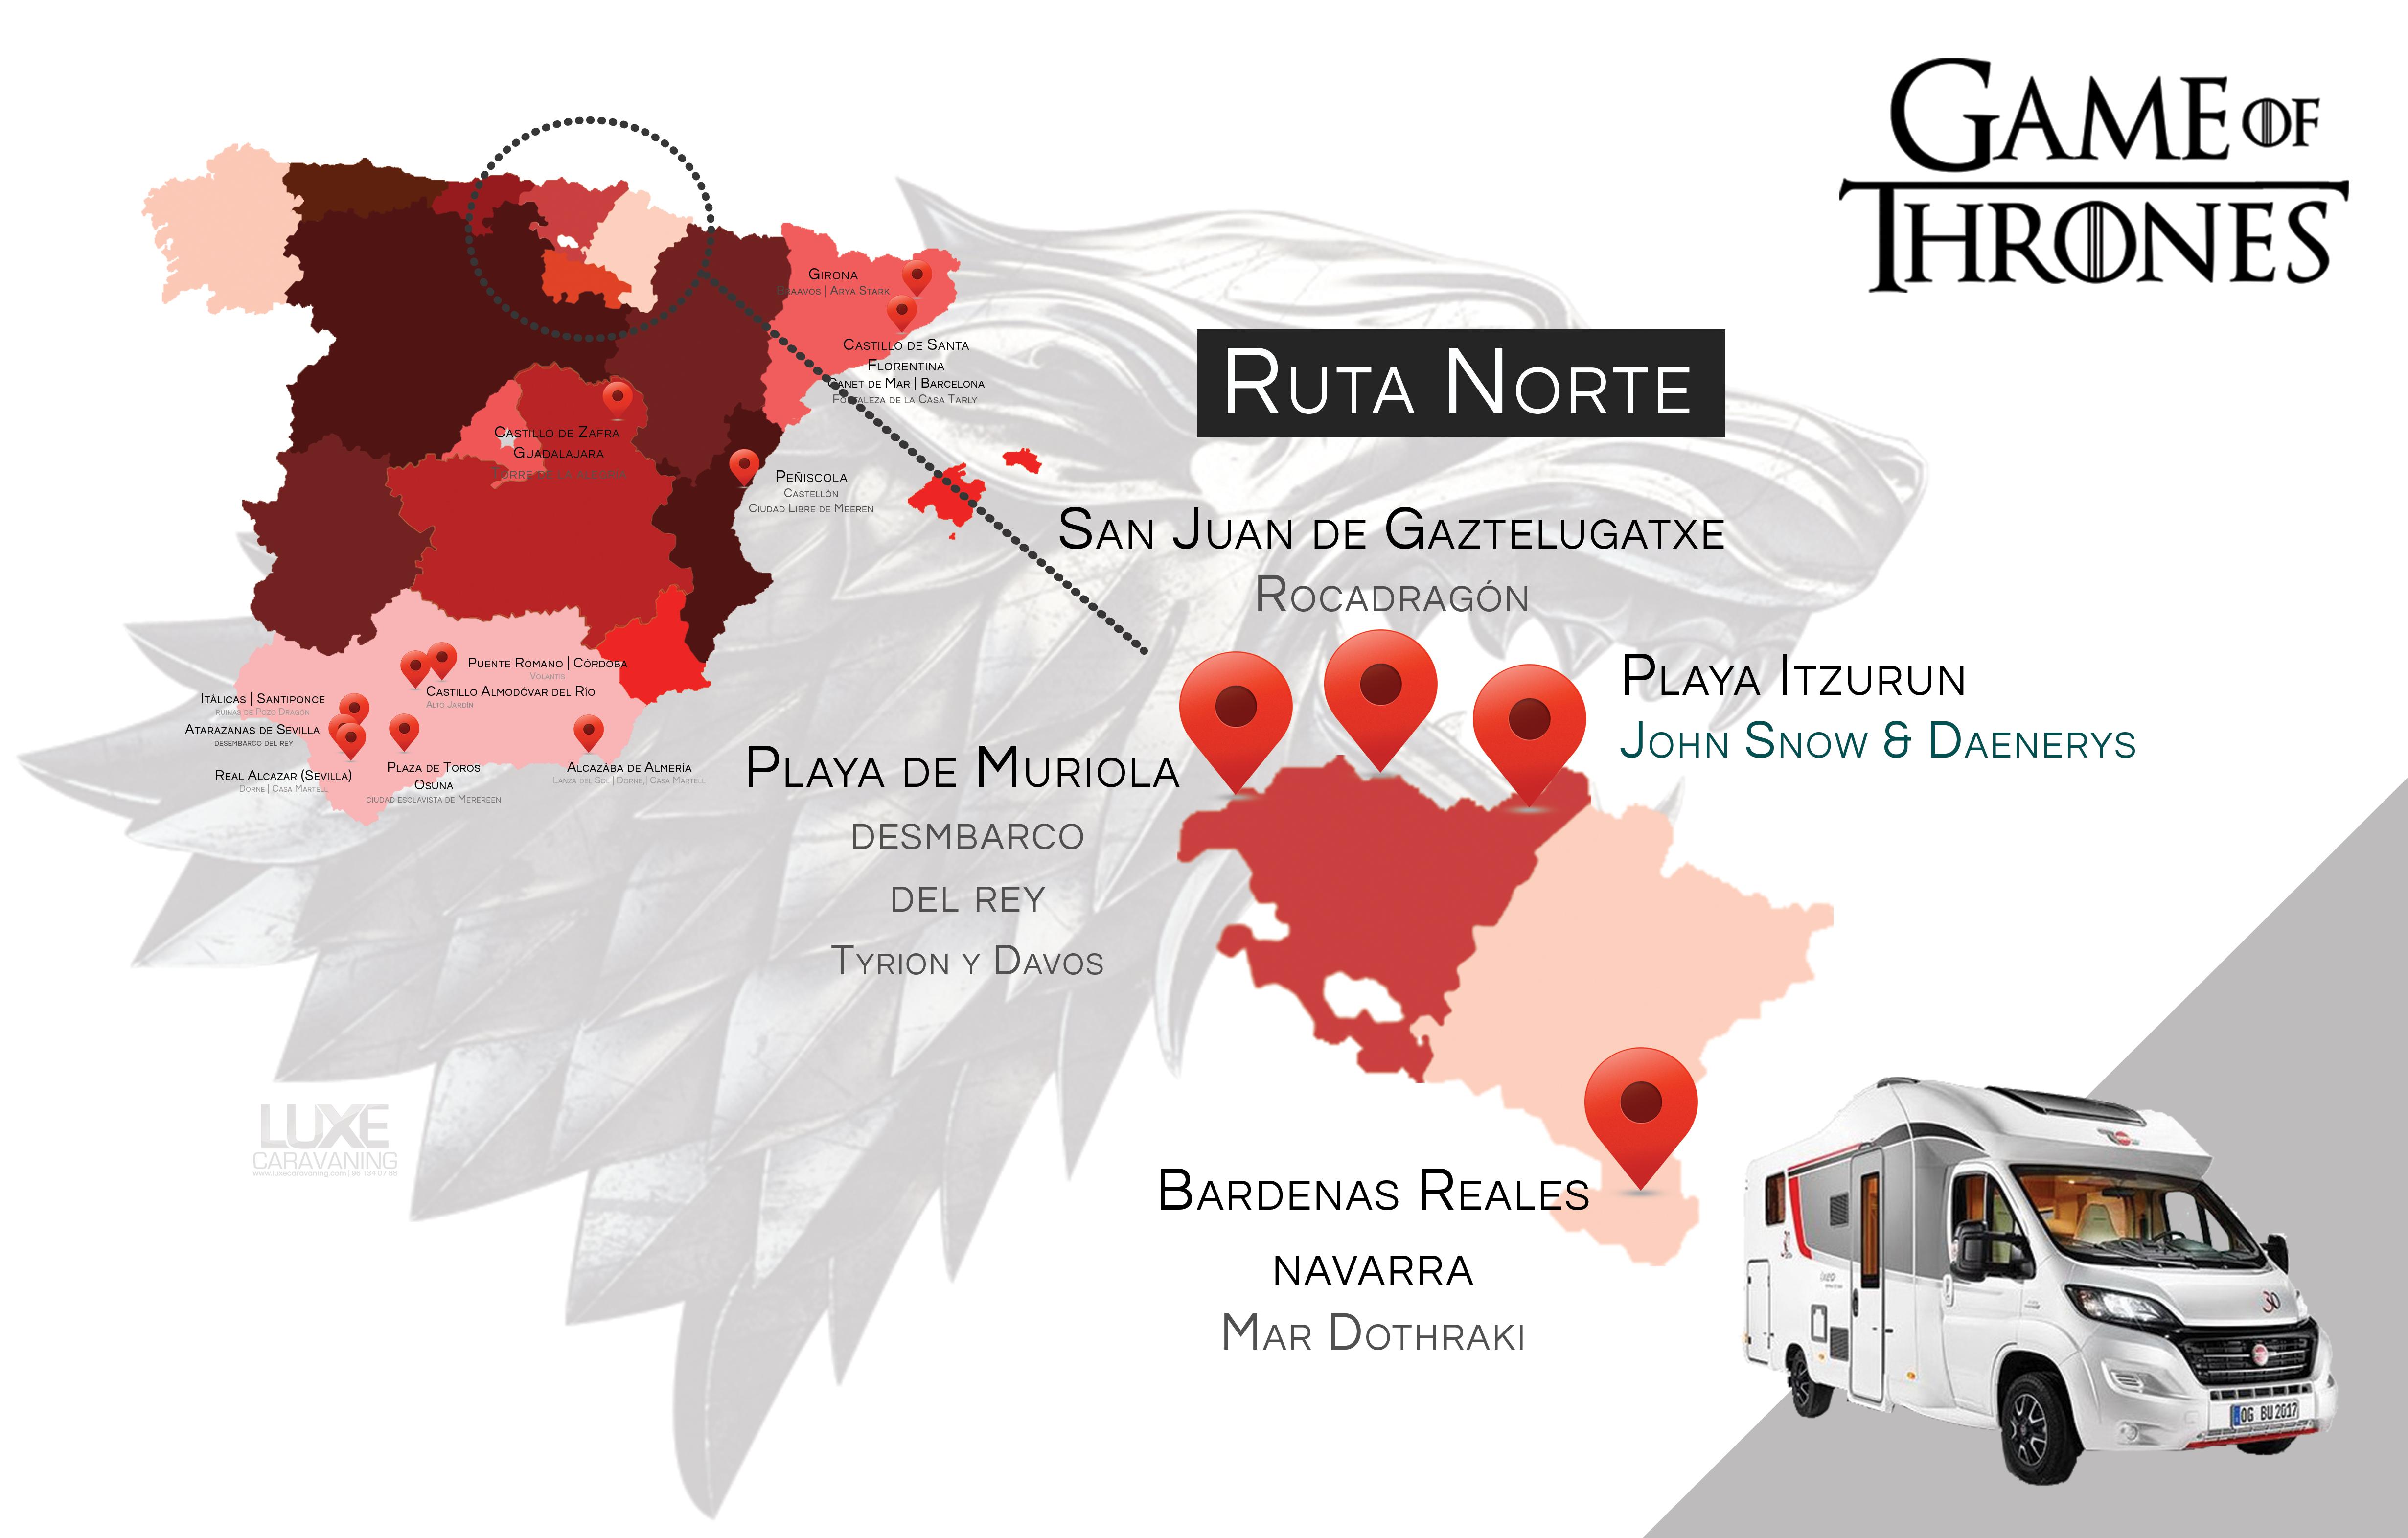 JUEGO DE TRONOS_RUTA_NORTE